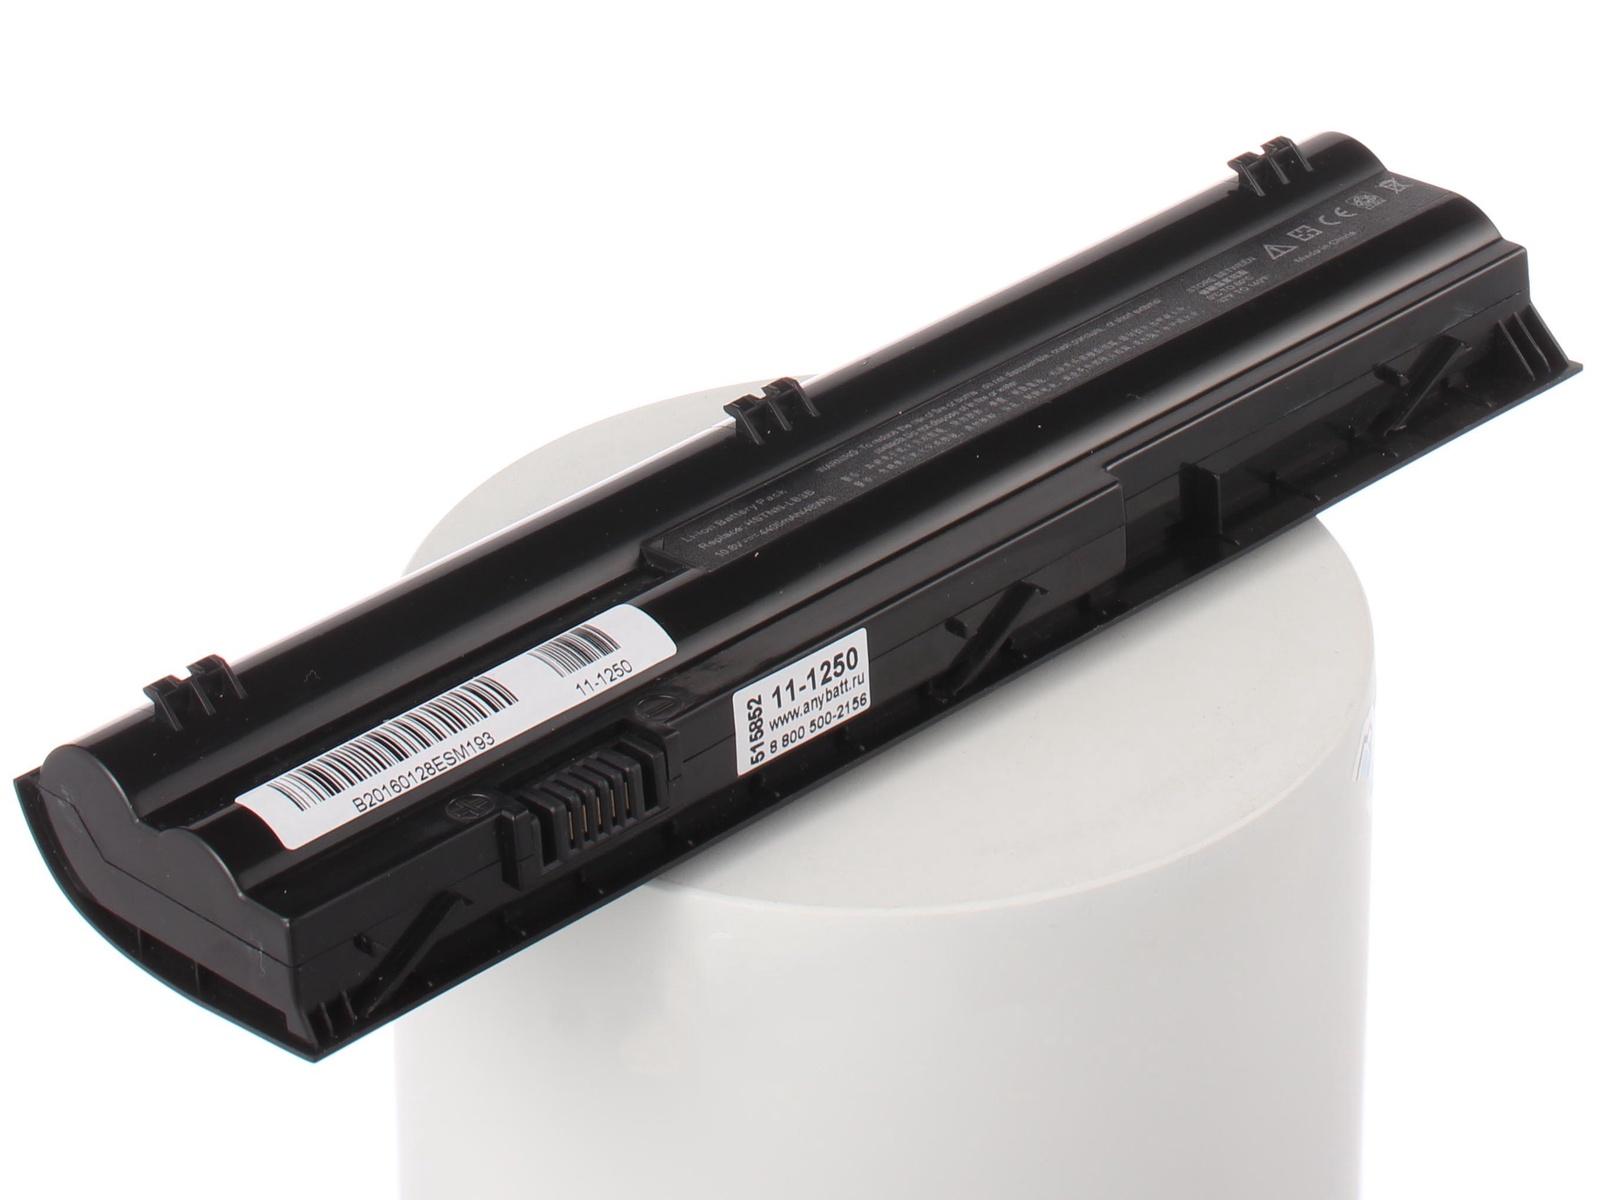 Аккумулятор для ноутбука AnyBatt для HP-Compaq Mini 200-4200, Mini 210-3001er, Mini 200-4250sr, Pavilion dm1-4000, Mini 200-4253sr, Mini 200-4251er, Pavilion dm1-4025sr, Pavilion dm1-4401sr, Mini 210-4102er, Mini 210-4150nr mini griptilian